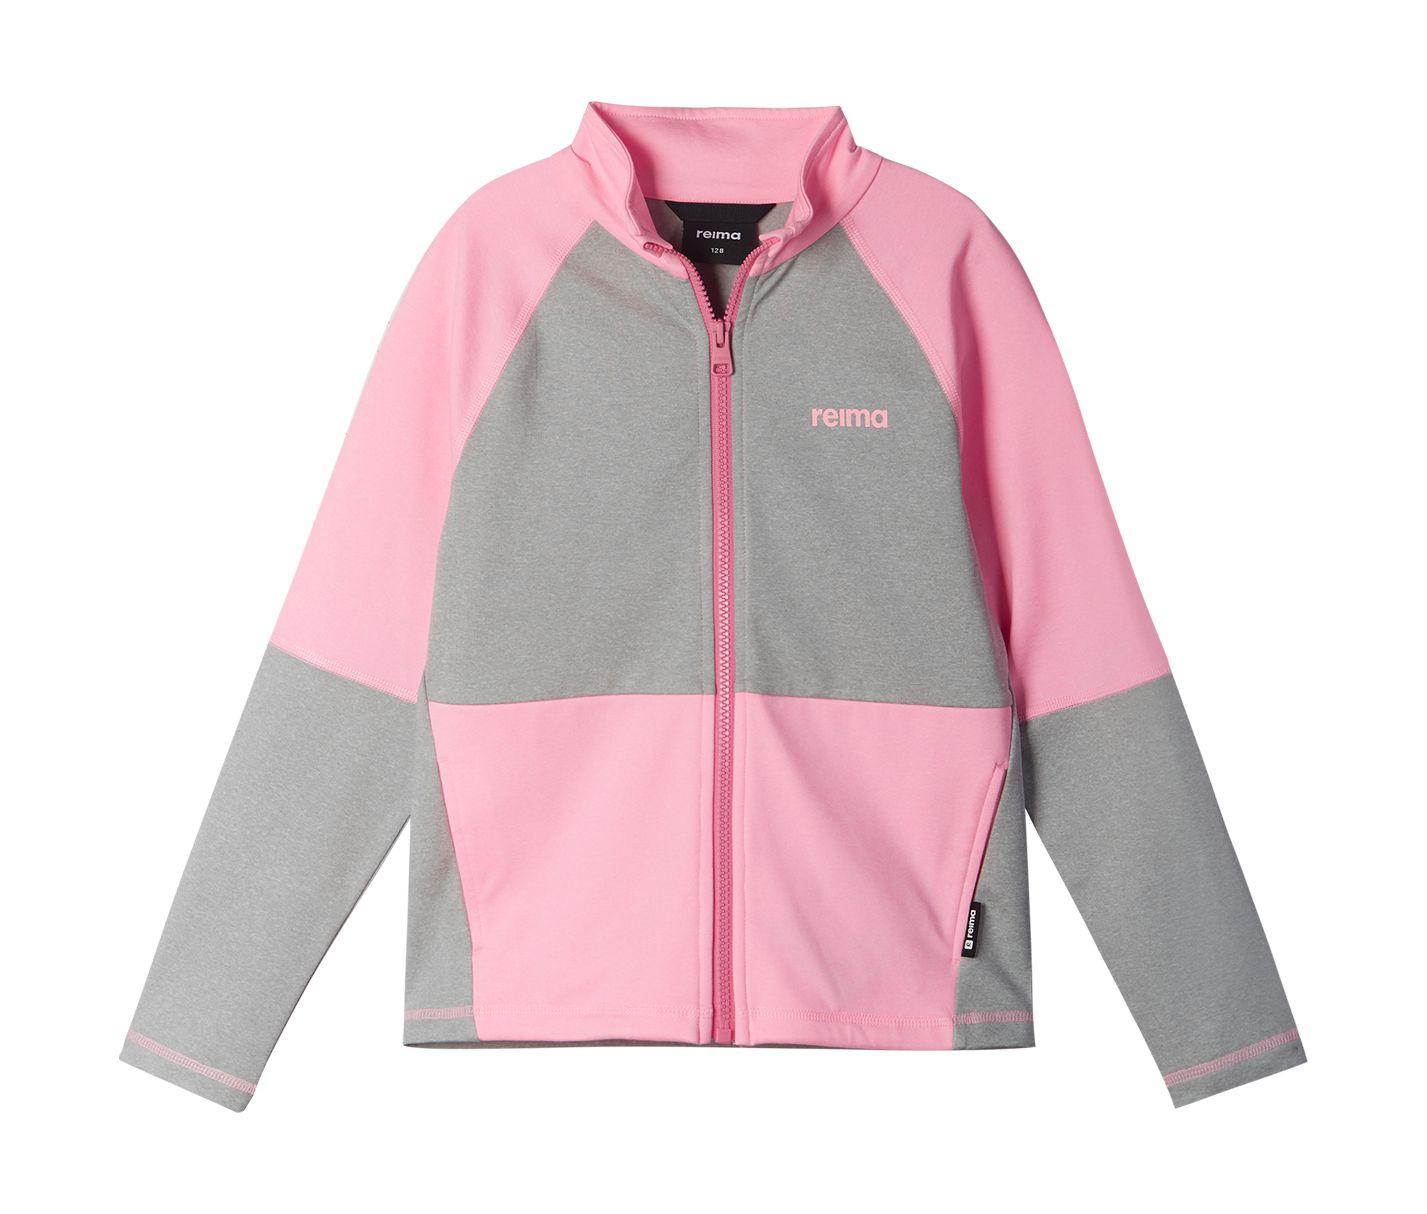 REIMA Mieti Neon Pink 116